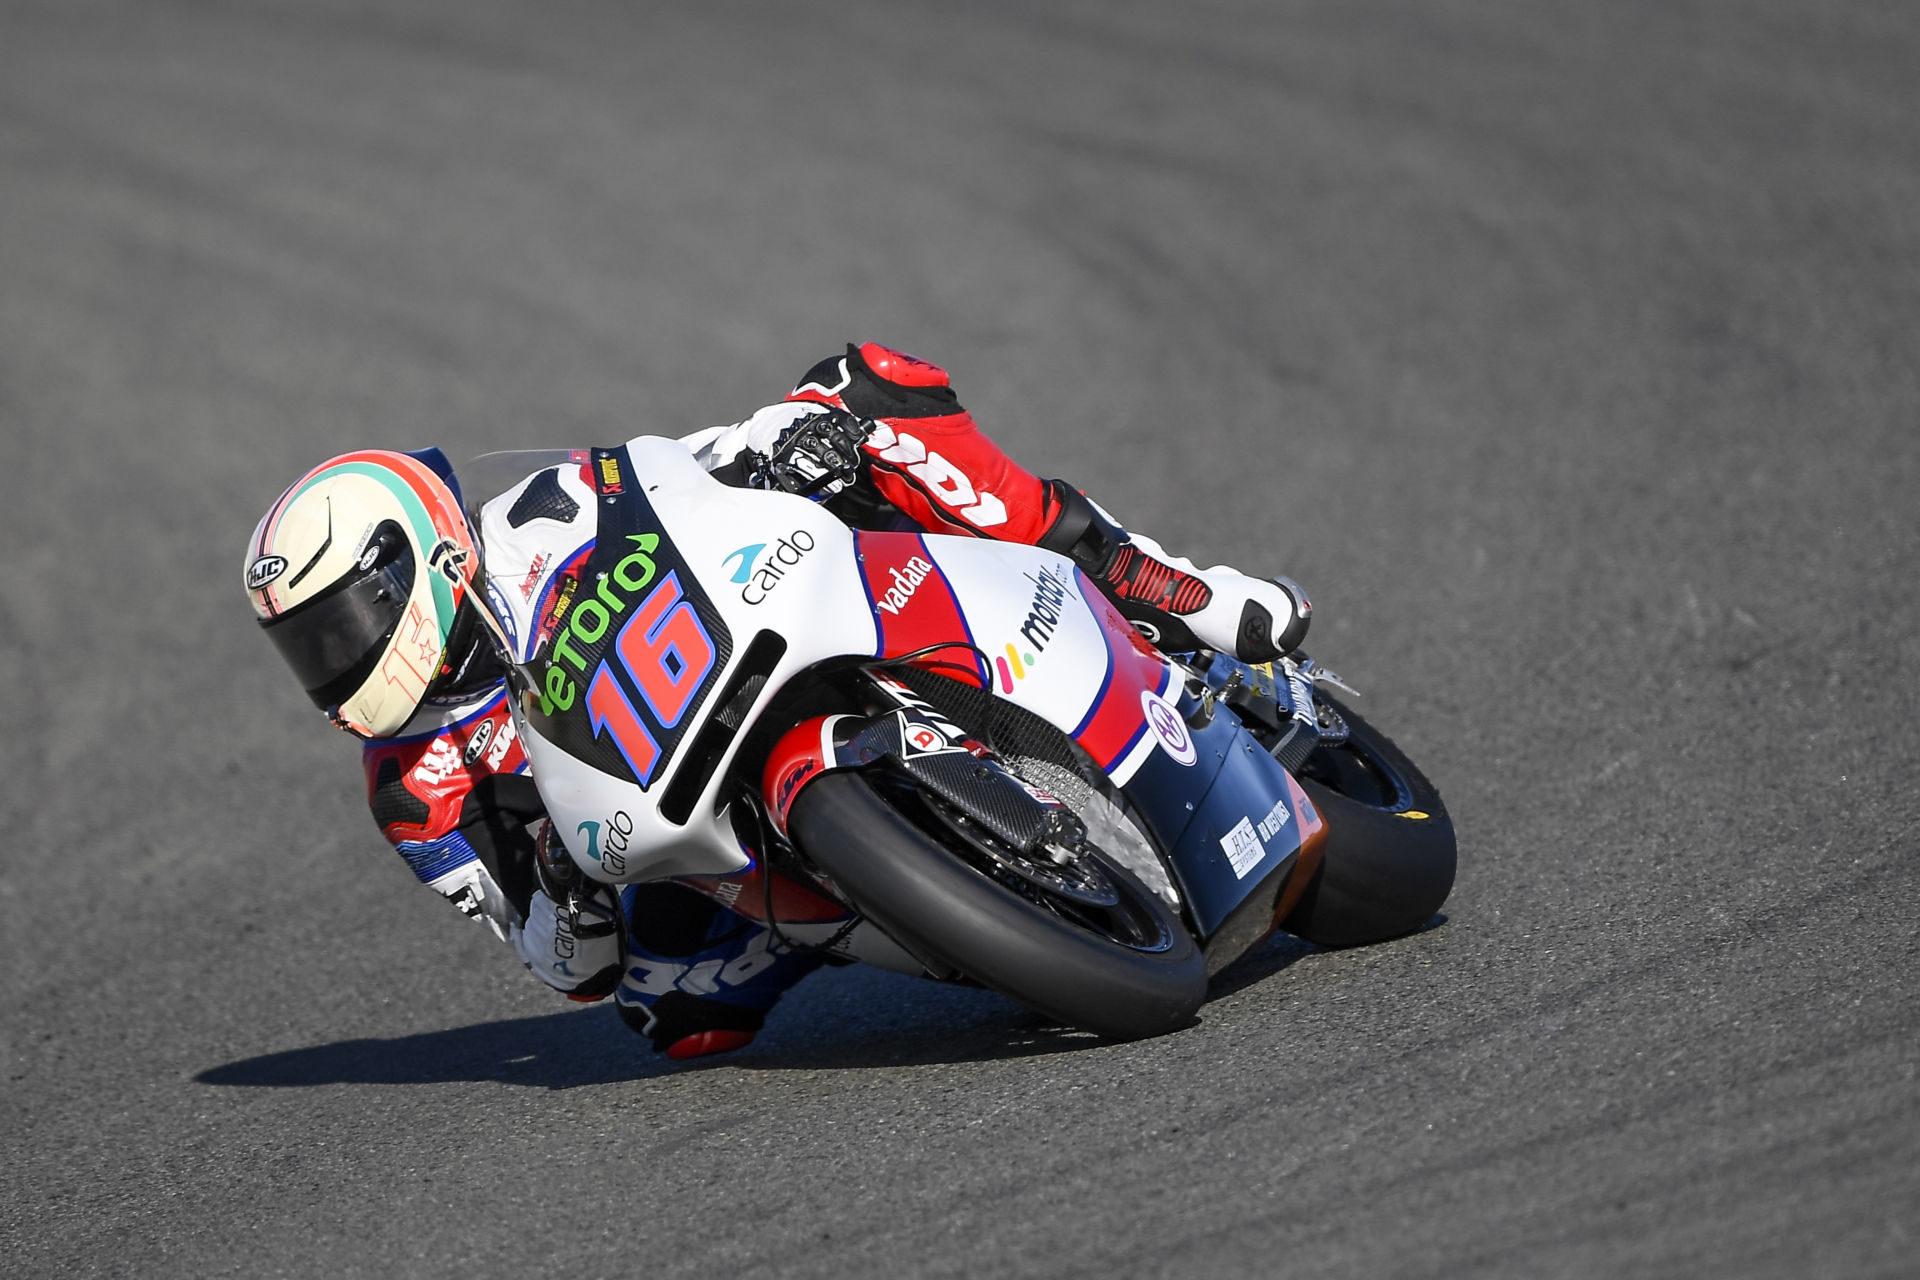 Motogp Moto2 Moto3 Rider Entry Lists For 2020 World Championships Roadracing World Magazine Motorcycle Riding Racing Tech News